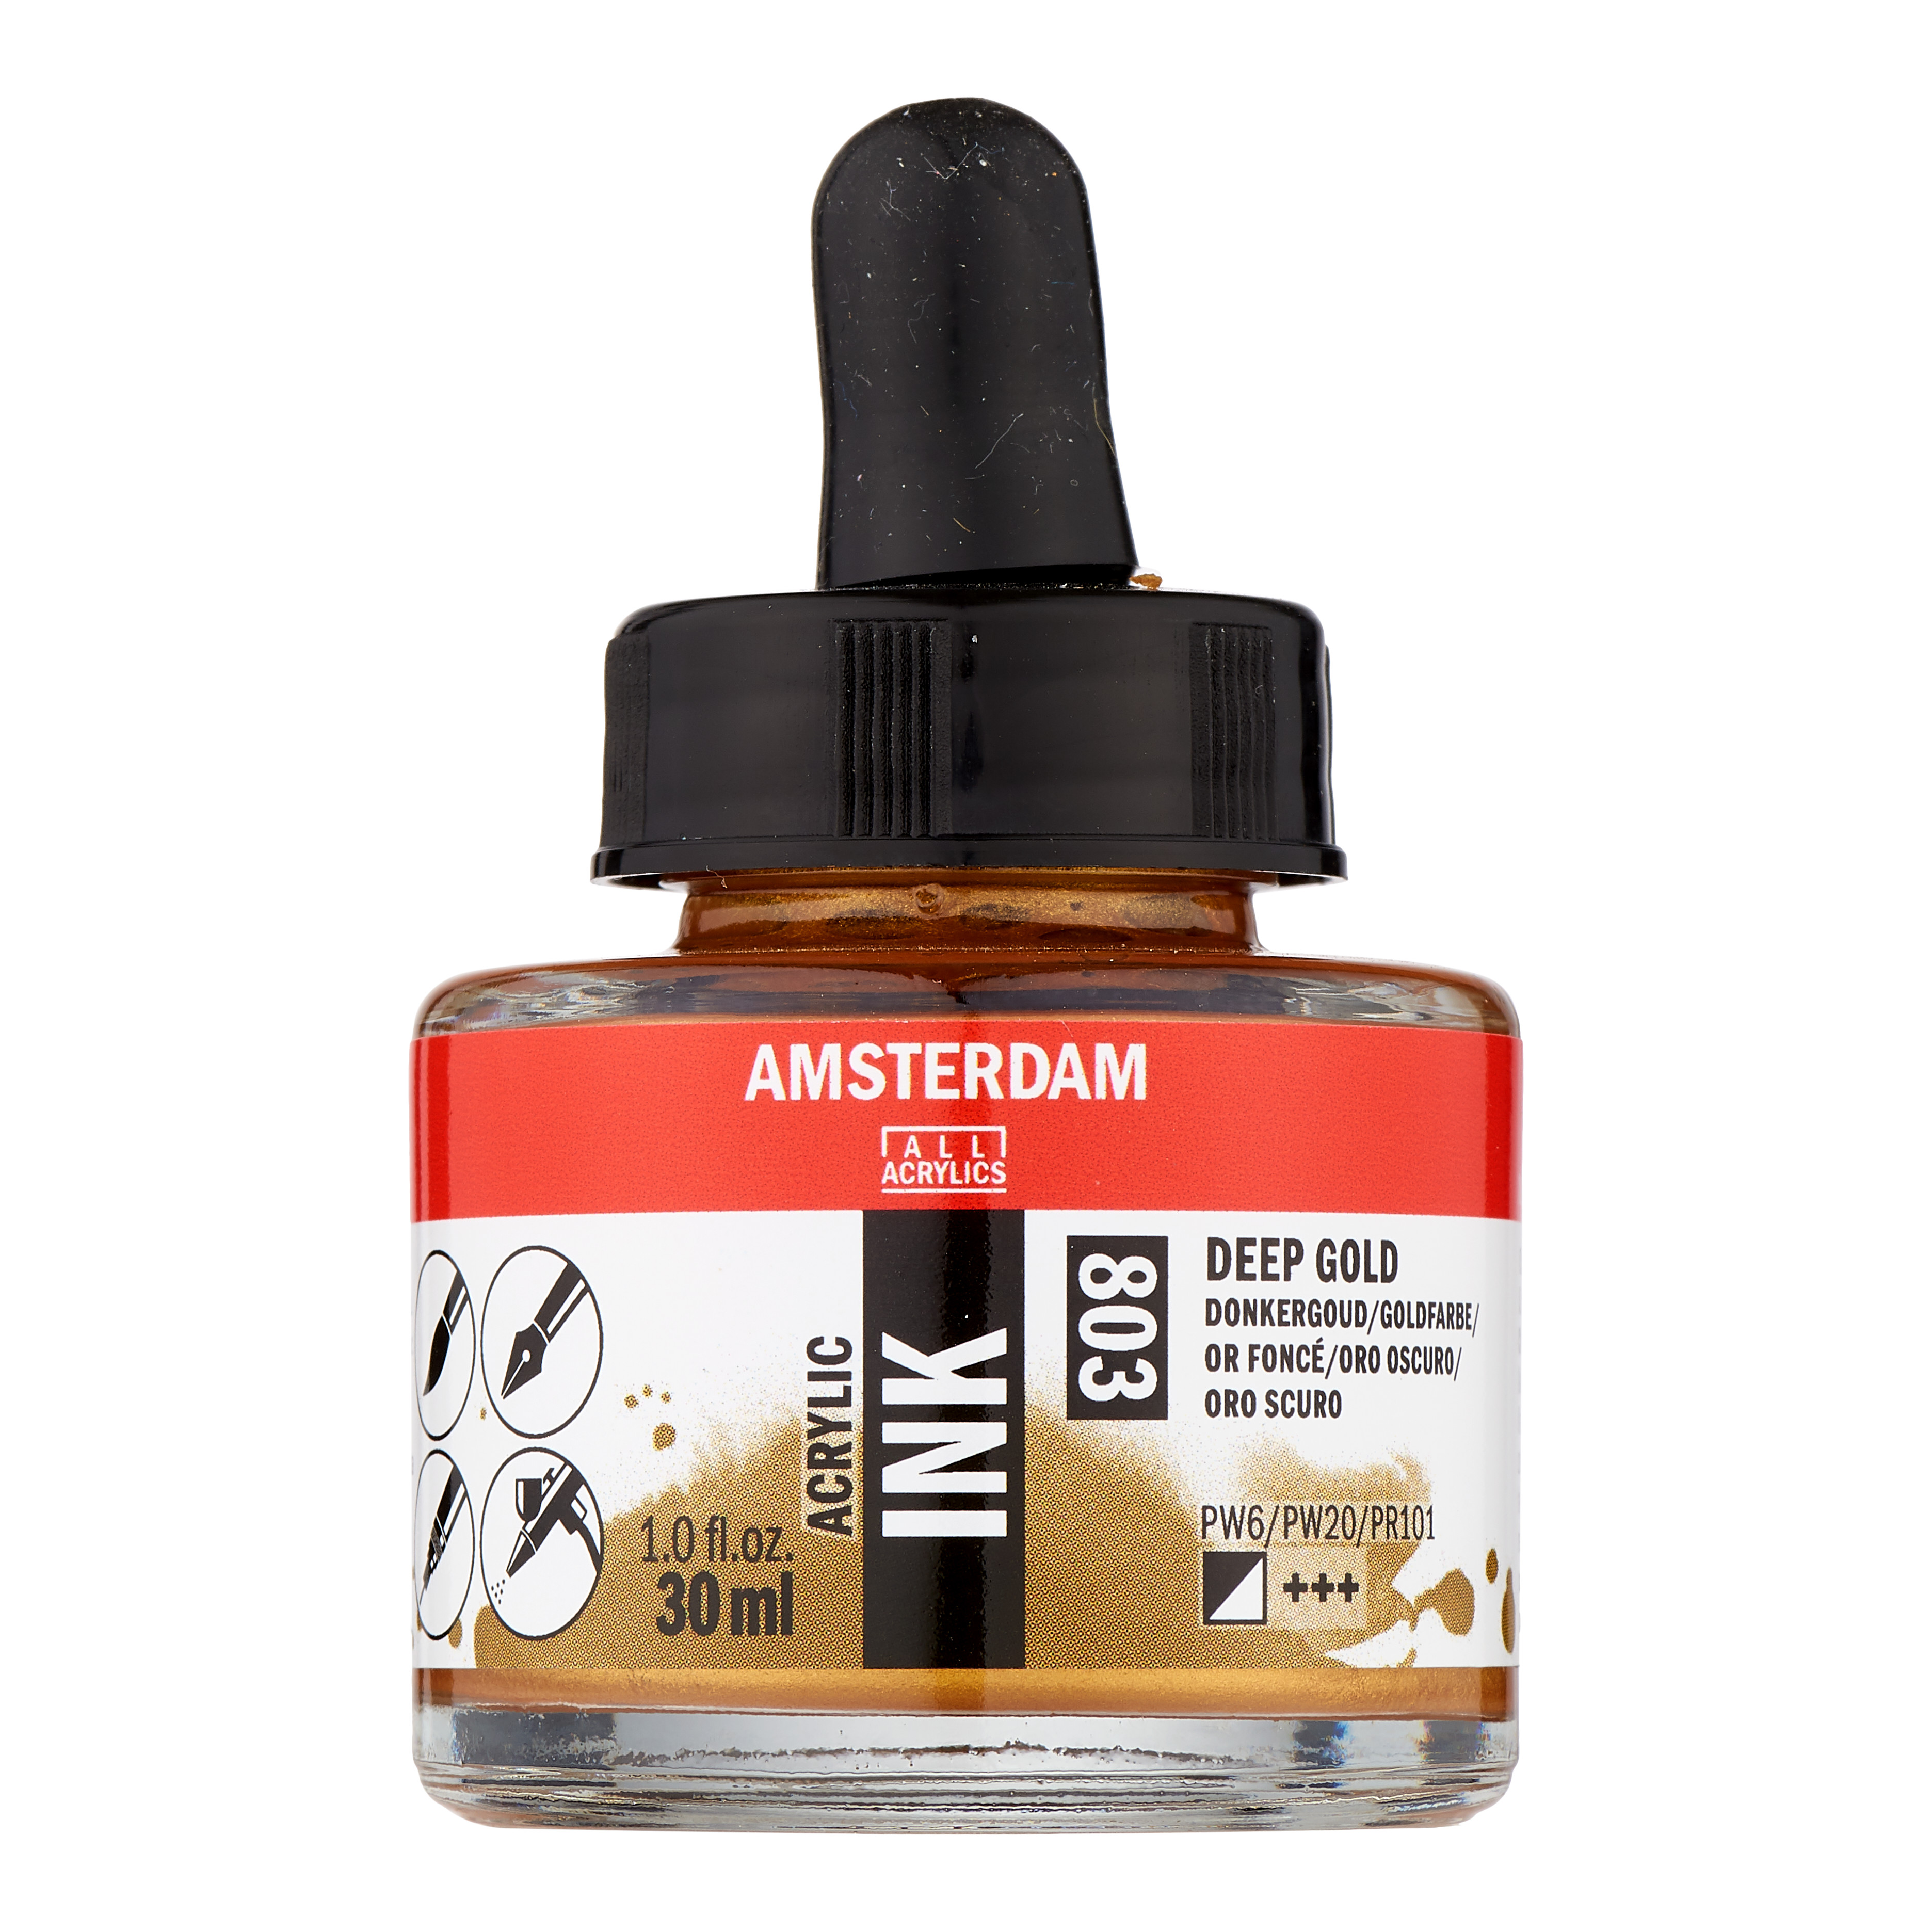 Amsterdam Acrylic Ink Bottle 30 ml Deep Gold 803